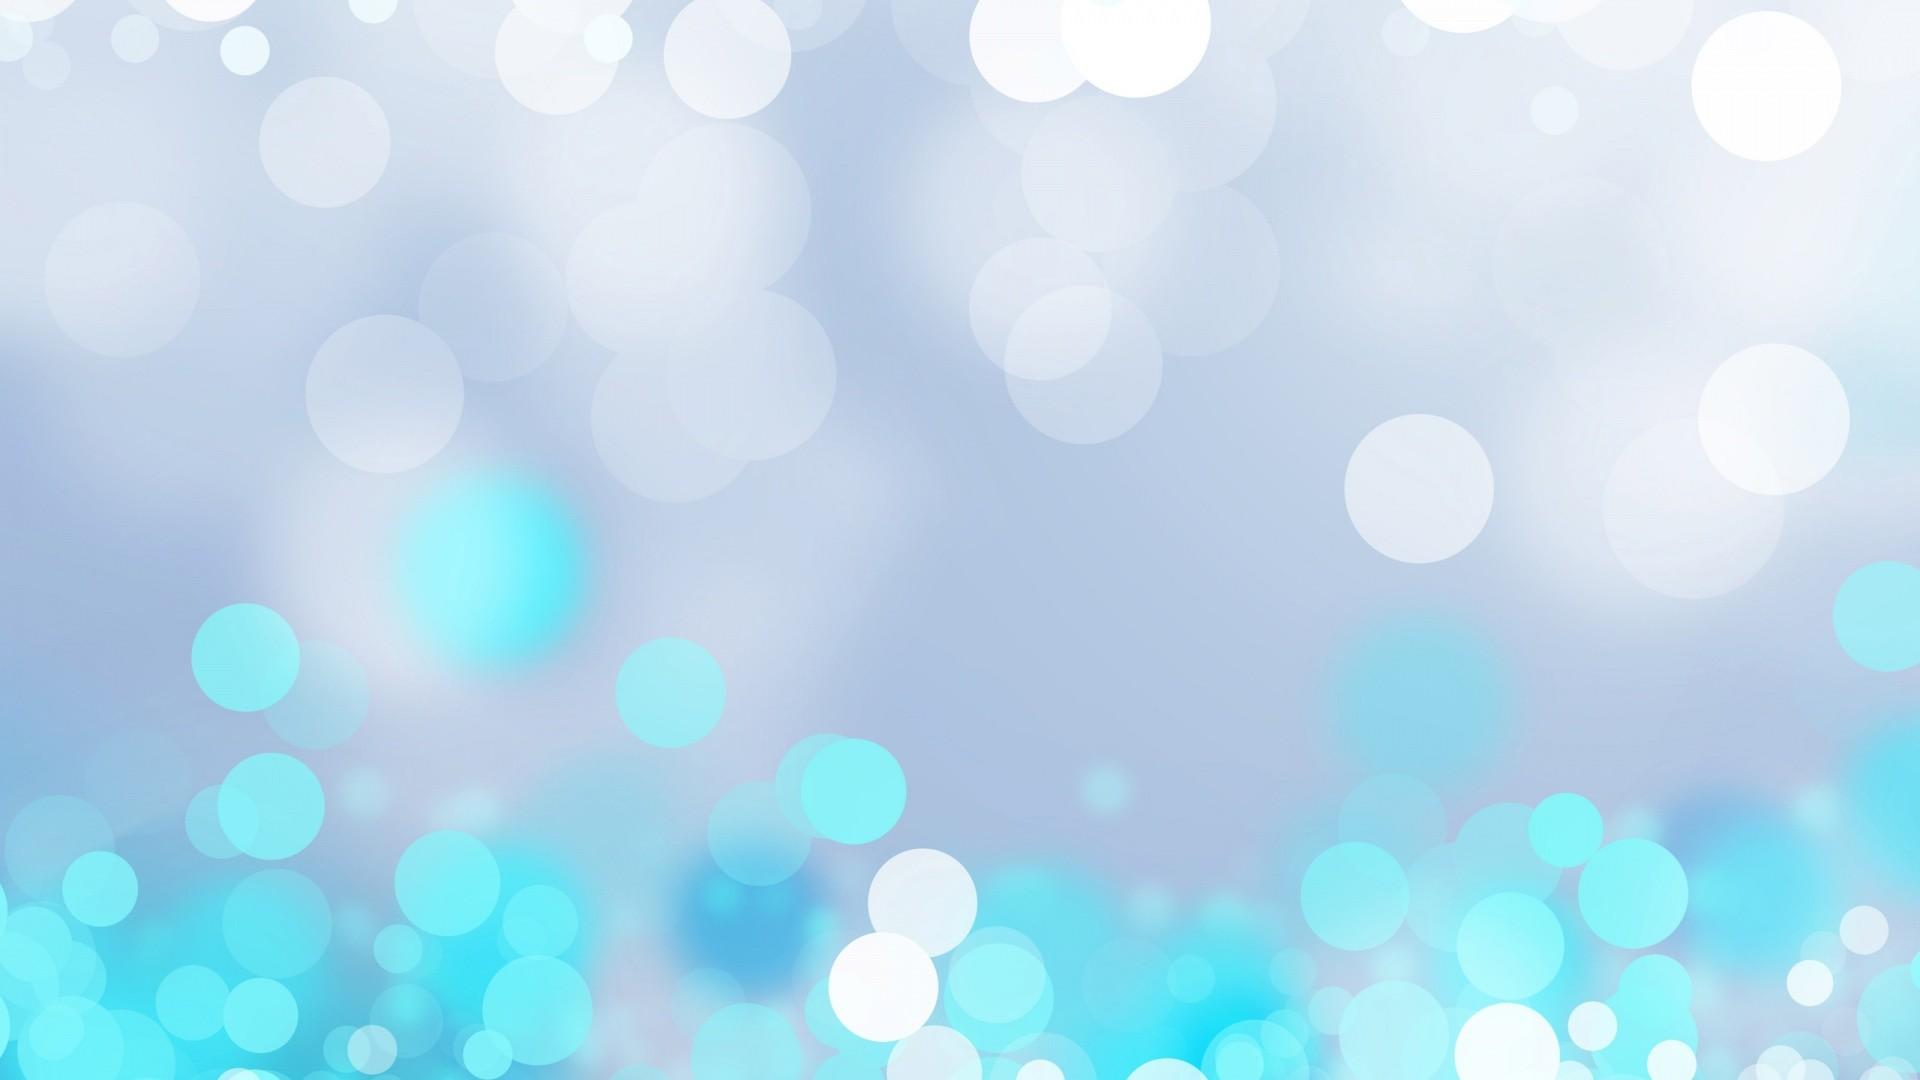 <b>Cute Candy Wallpapers 13</b> Desktop Background – Hivewallpaper.